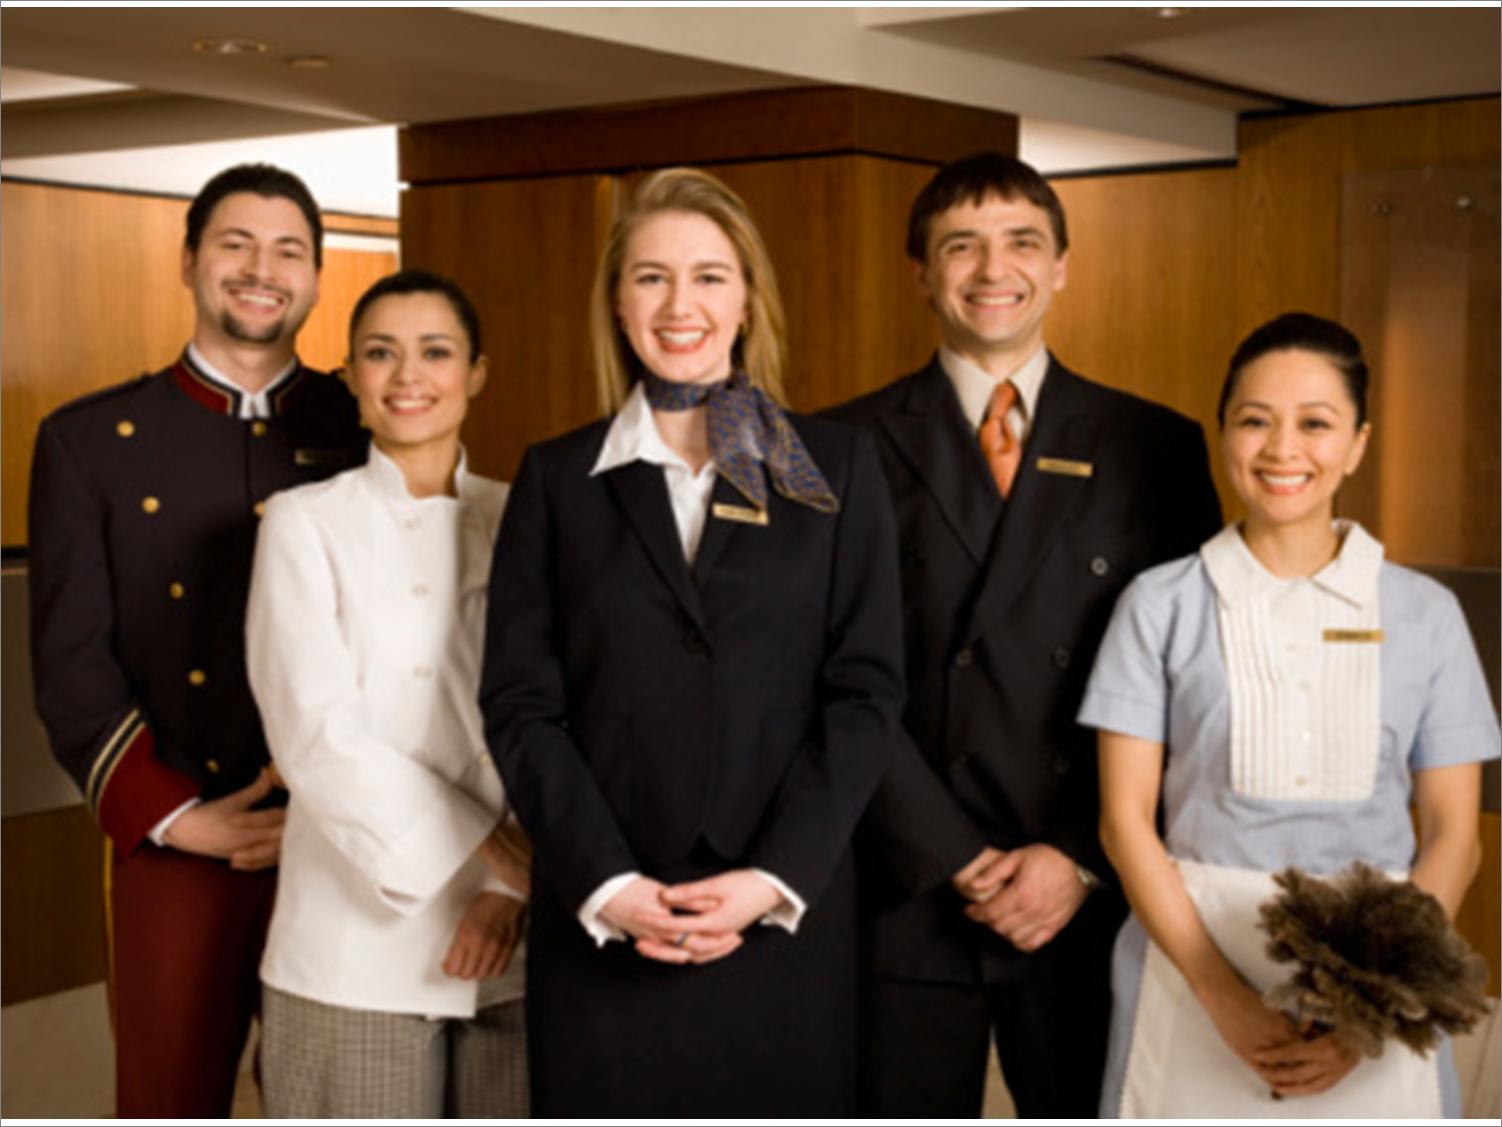 Hospitality Sector in Dubai and UAE